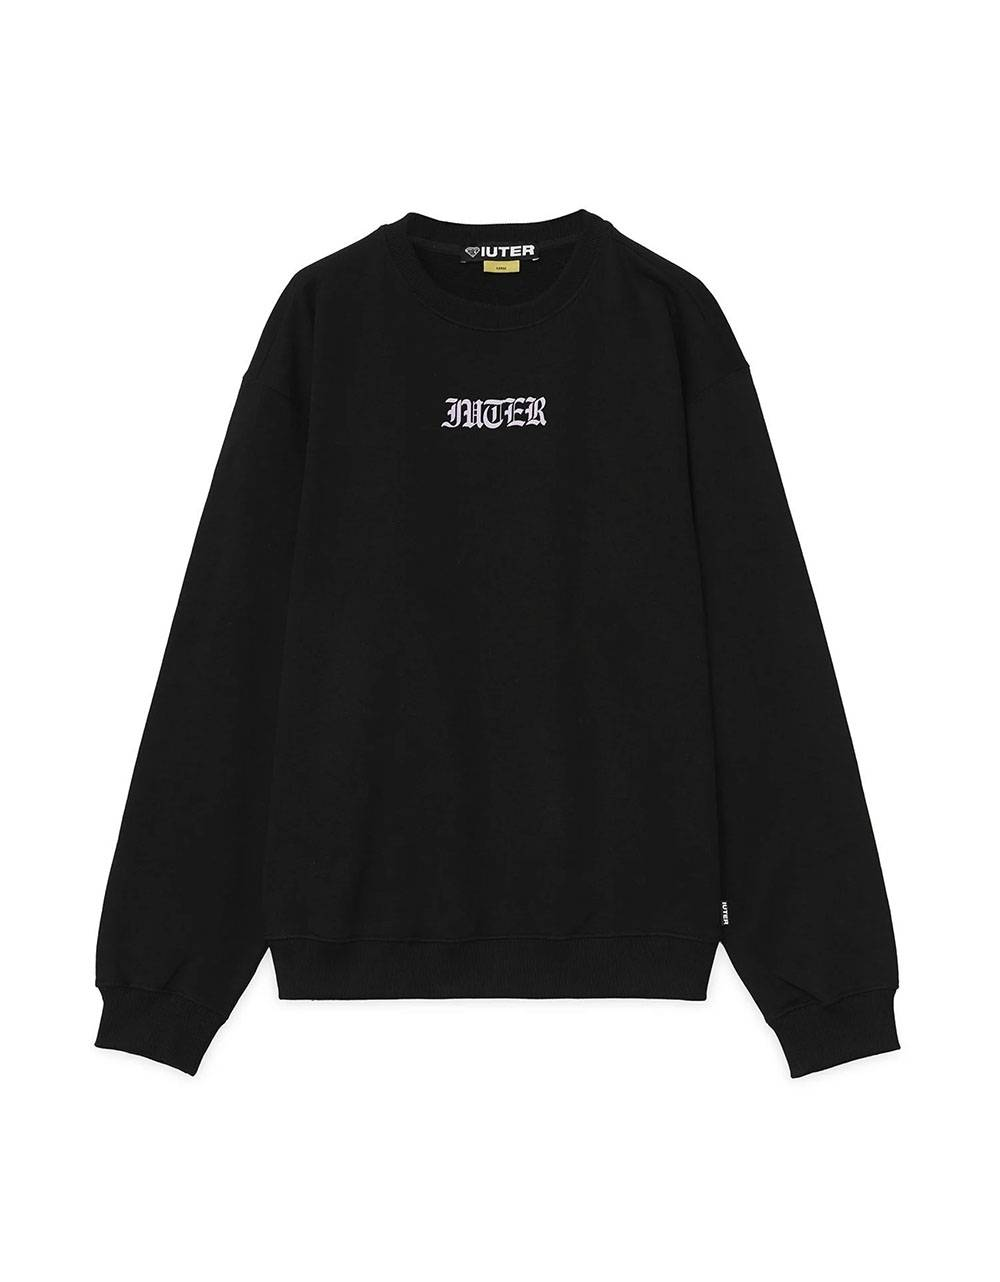 Iuter Noone crewneck sweater - Black IUTER Sweater 90,00€